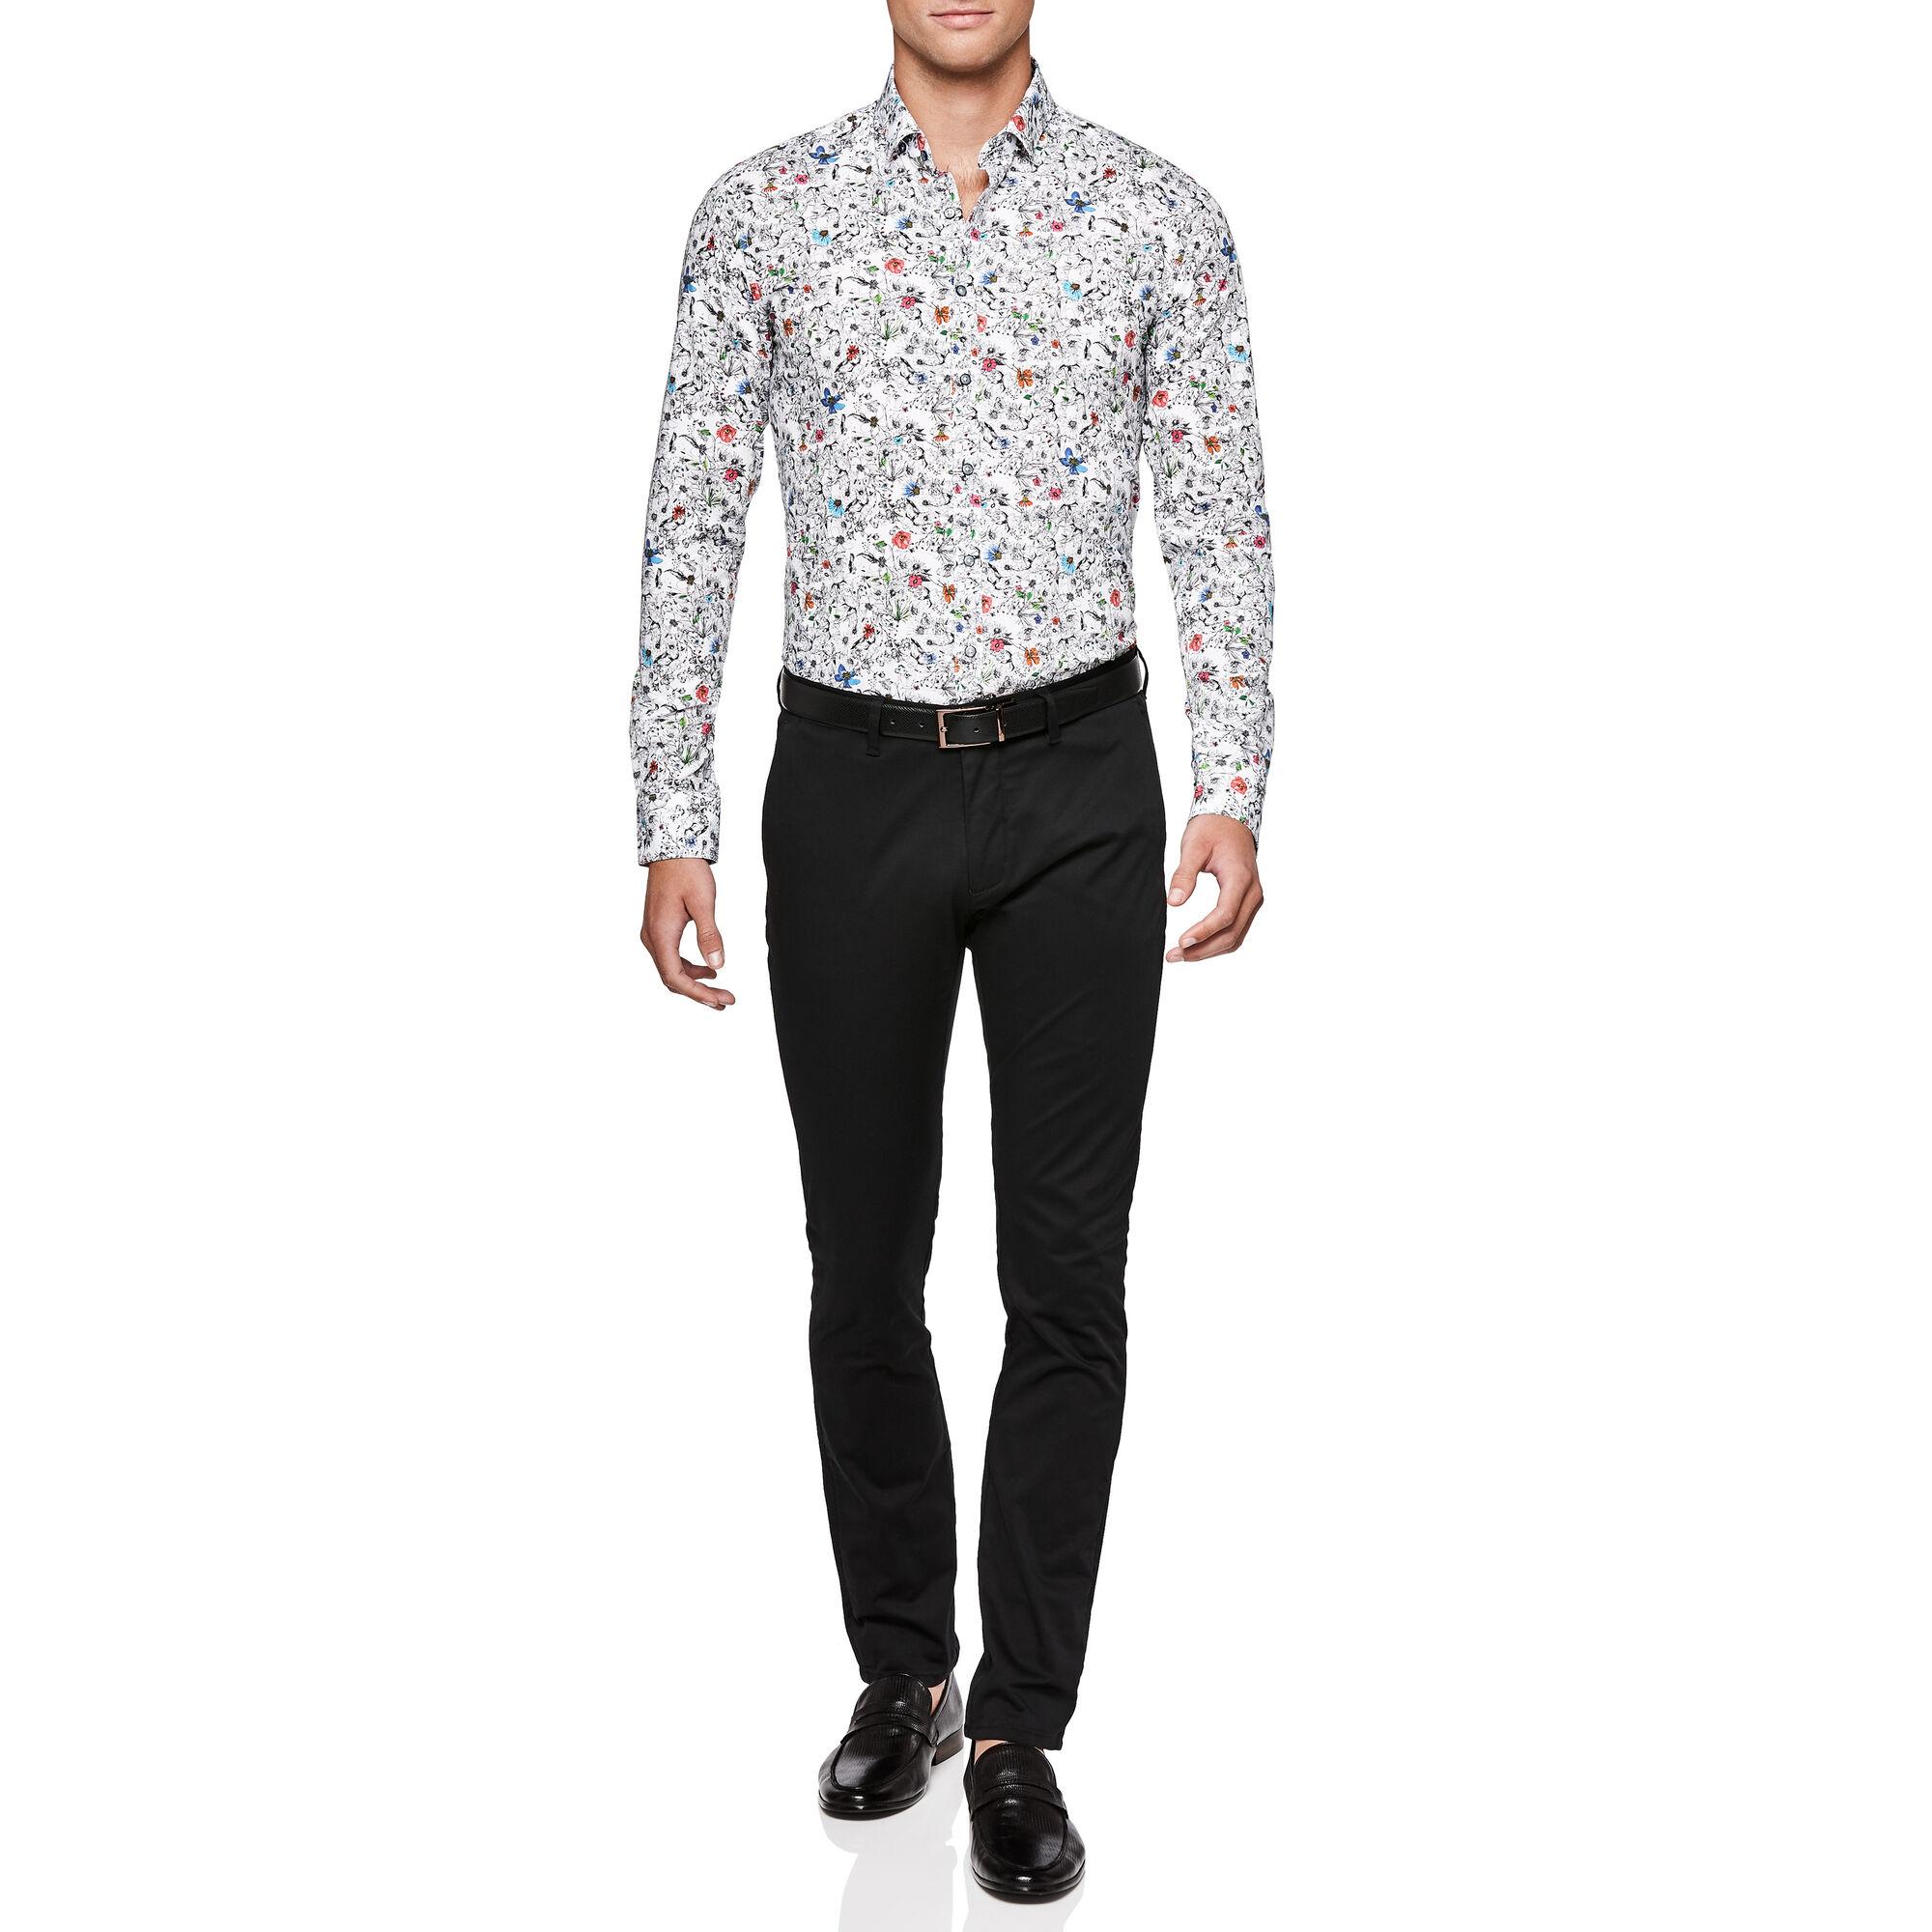 c1ce97ee157 Collin - Multi Floral - L/S Italian Fabric Floral Shirt | Politix